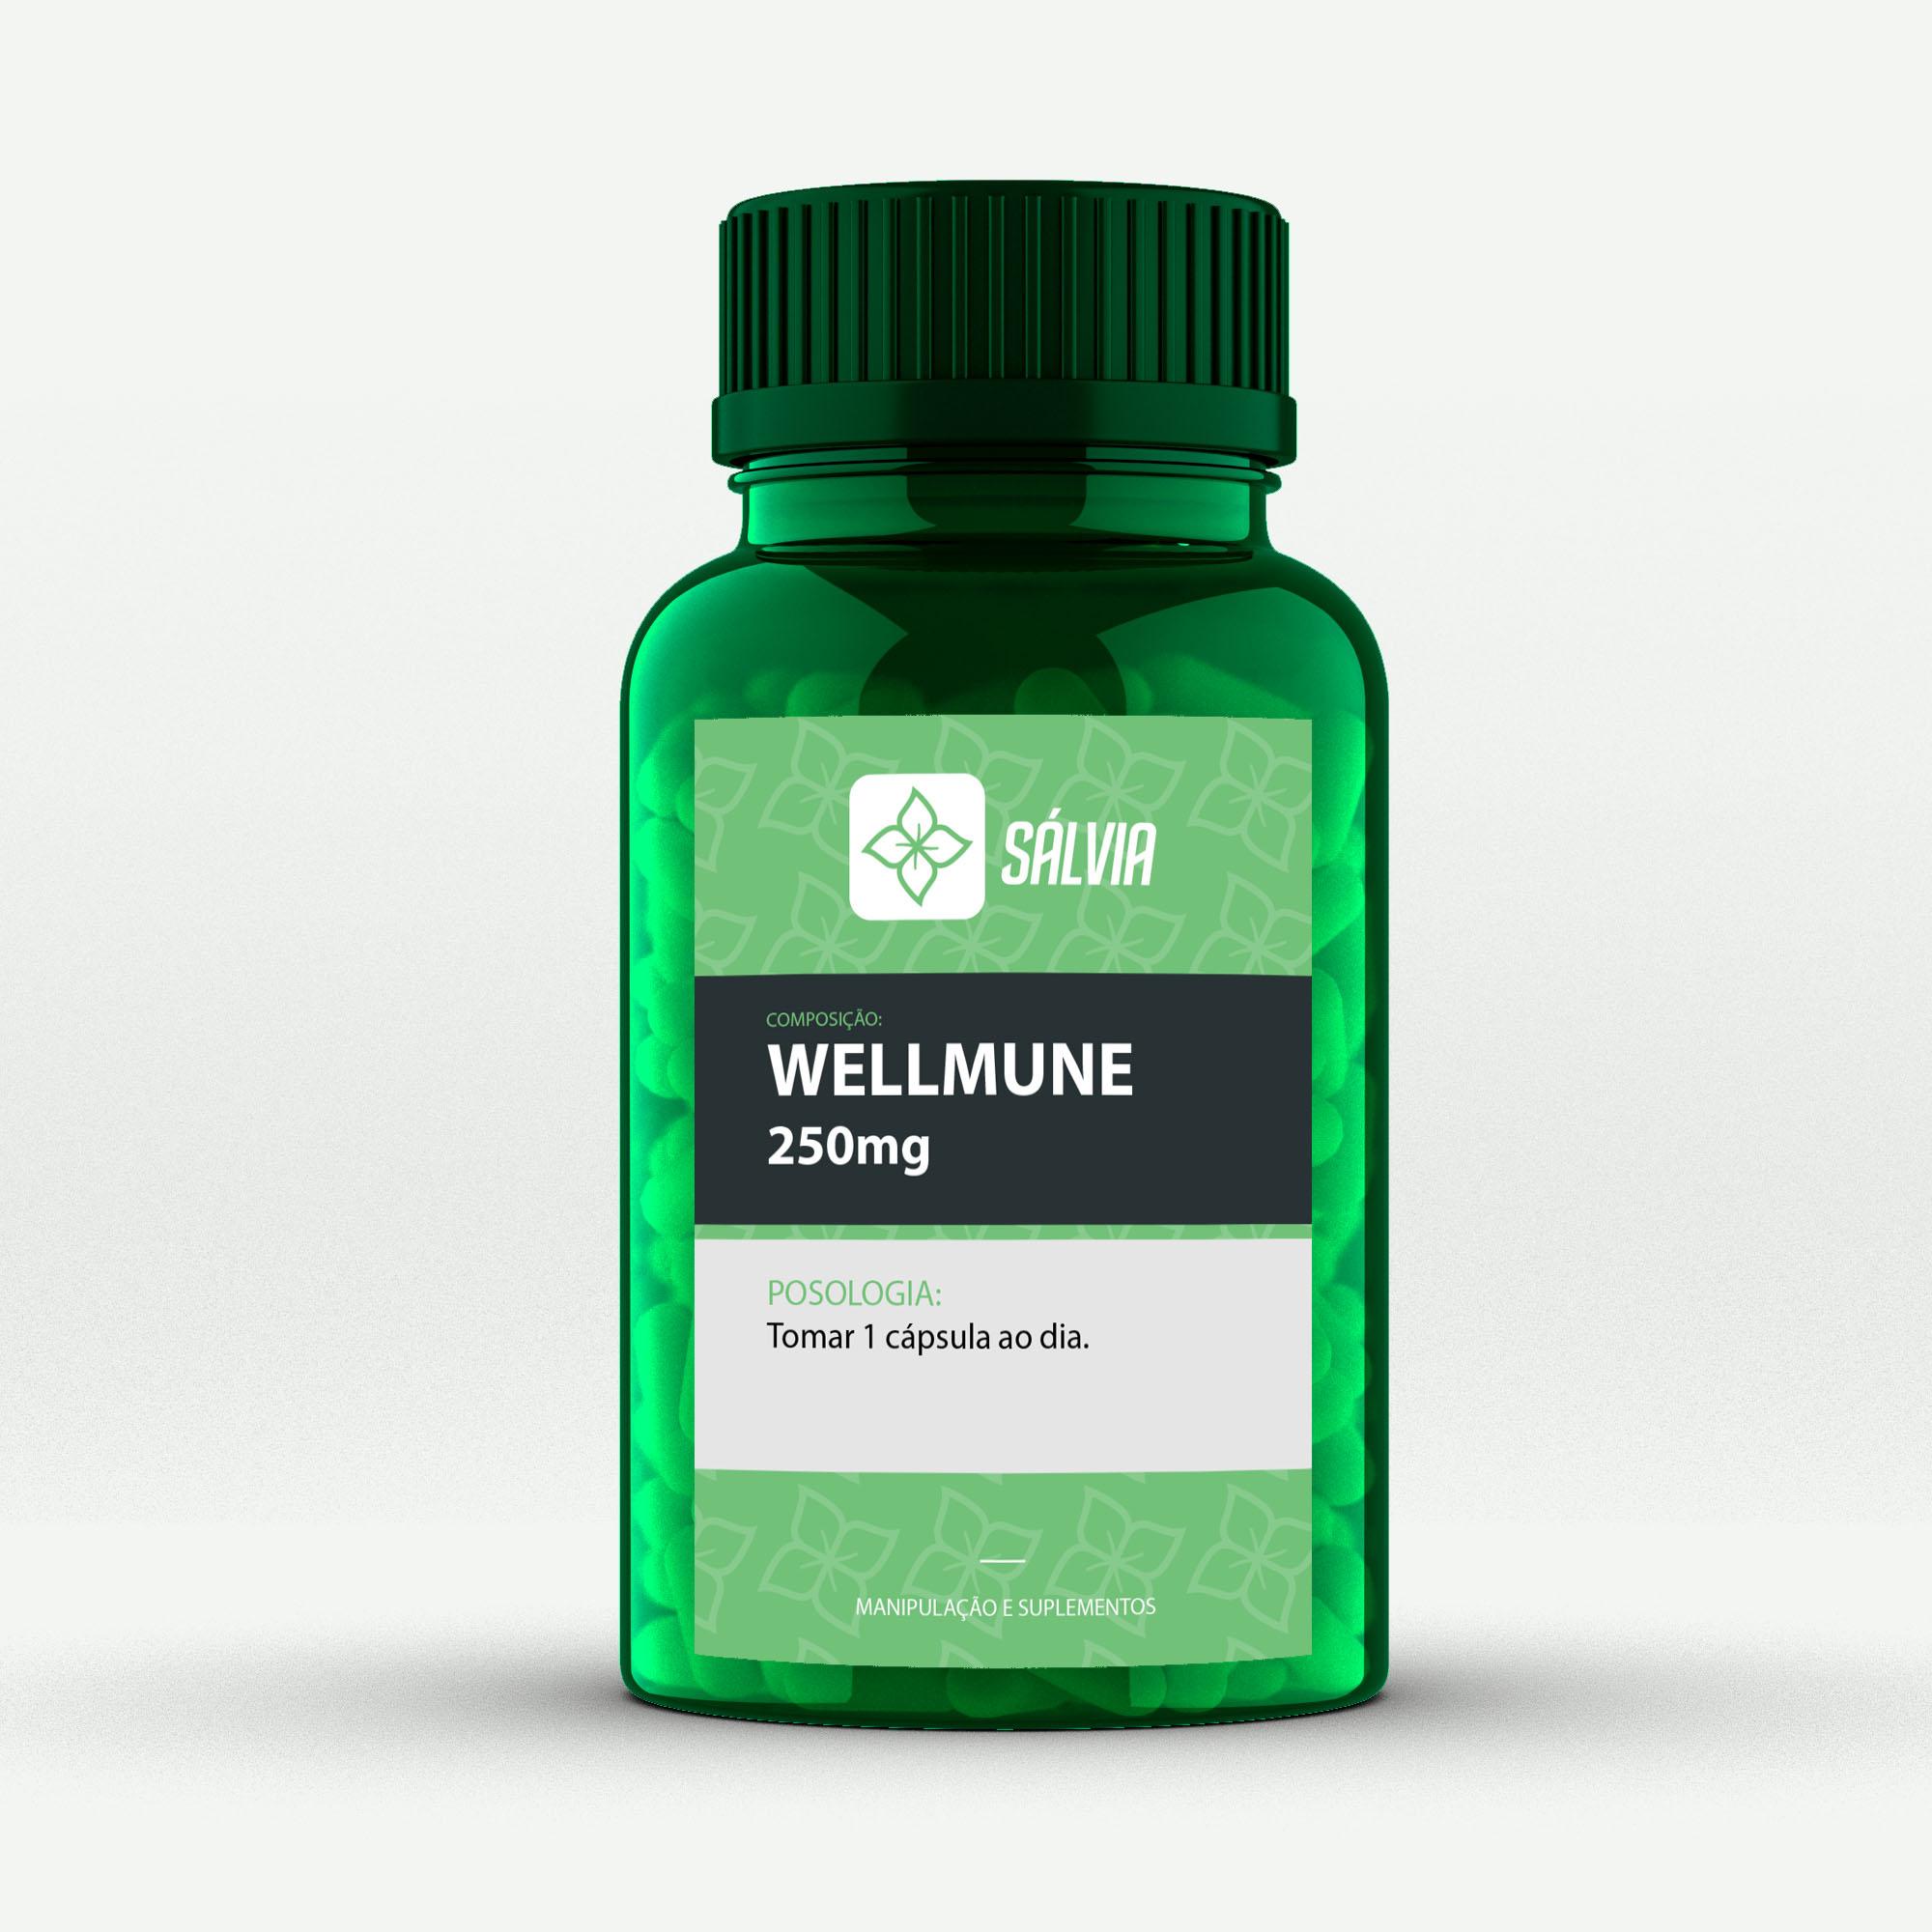 WELLMUNE 250mg - Cápsulas